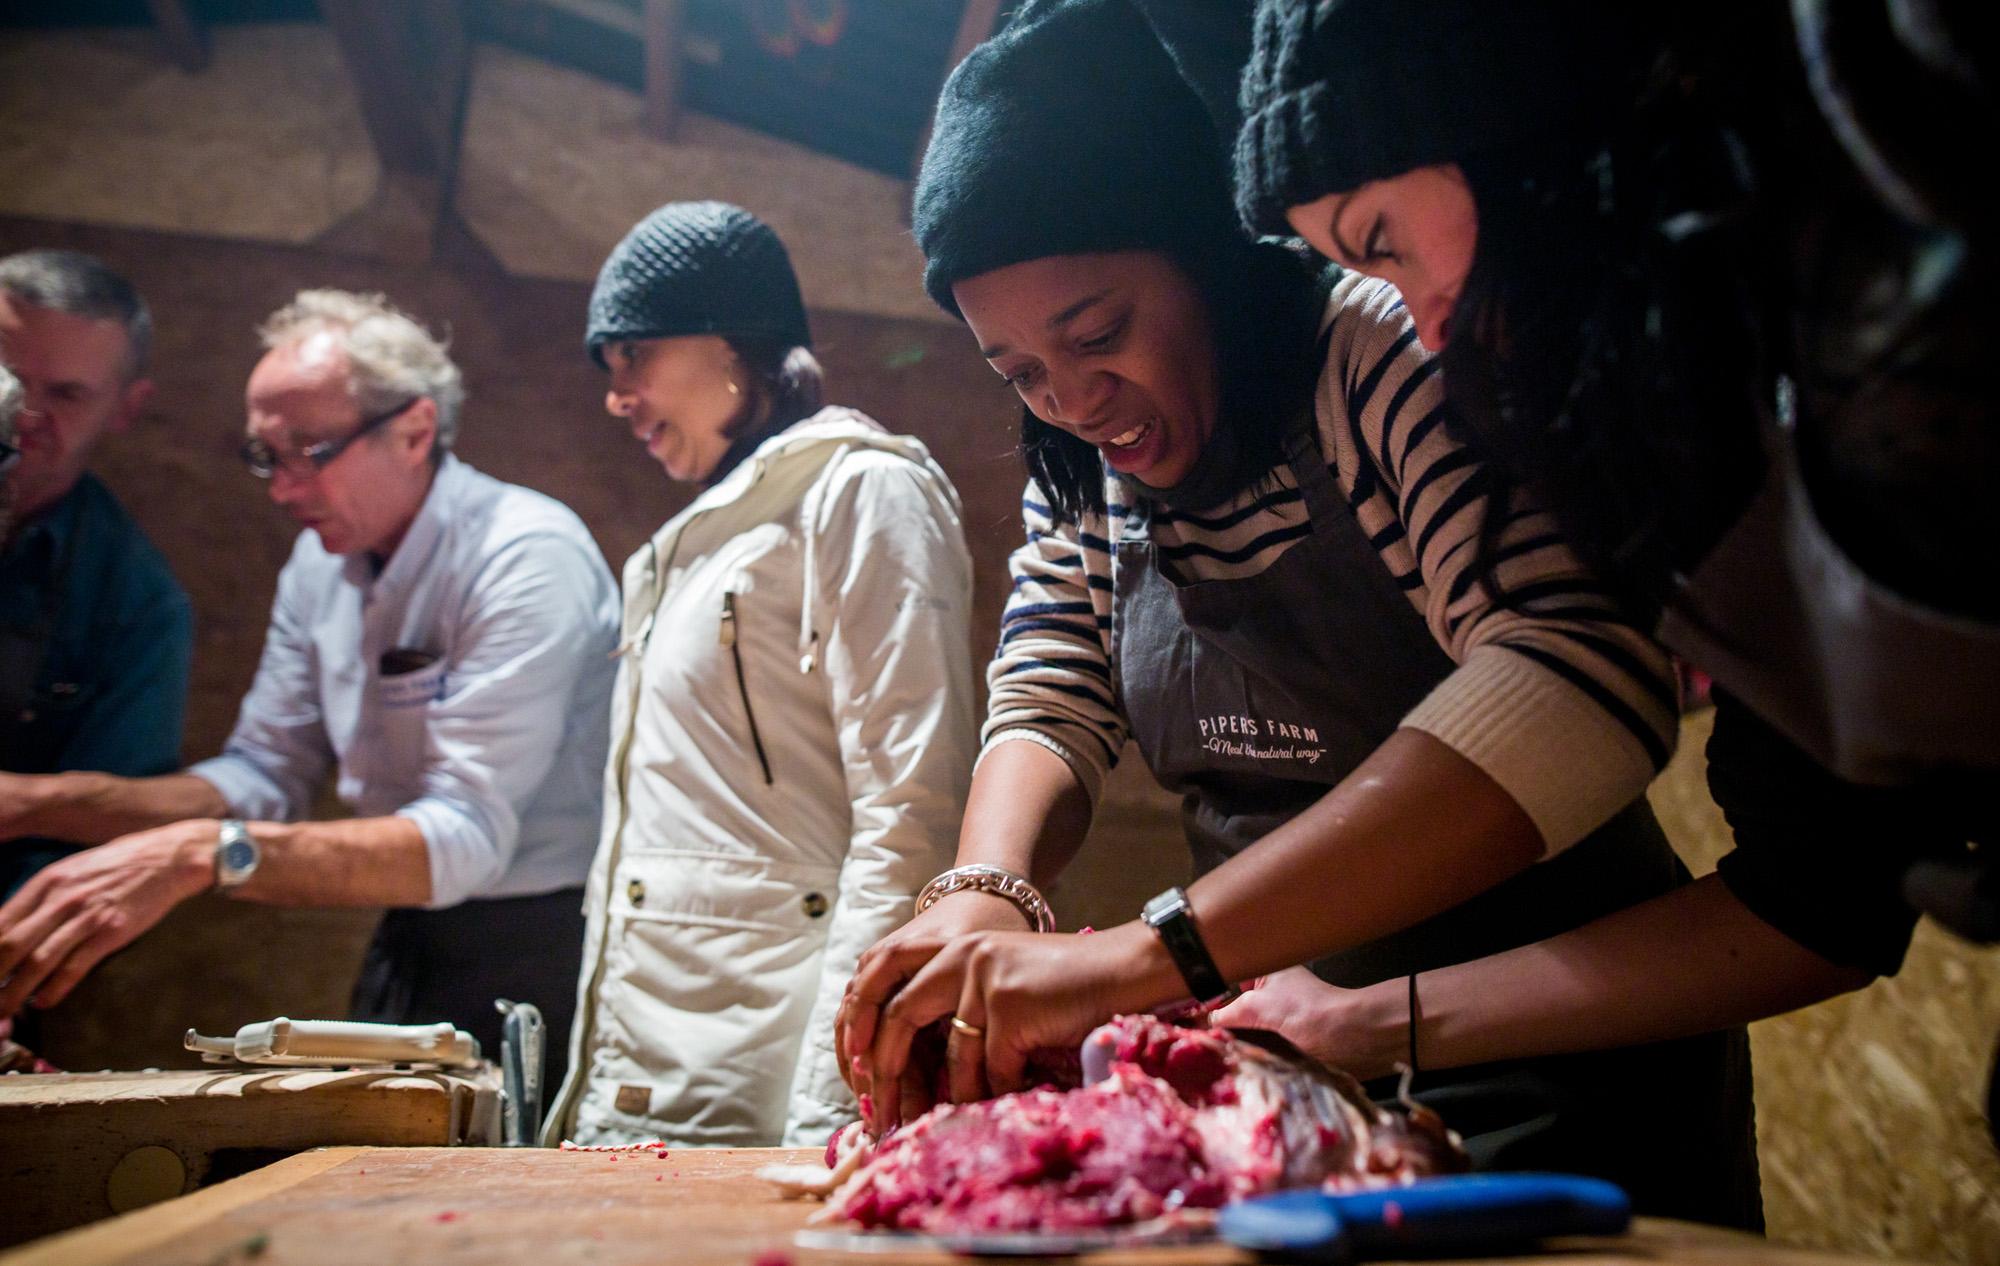 Teambuilding The Feast Project at Huntsham Court - credit Luna Photography